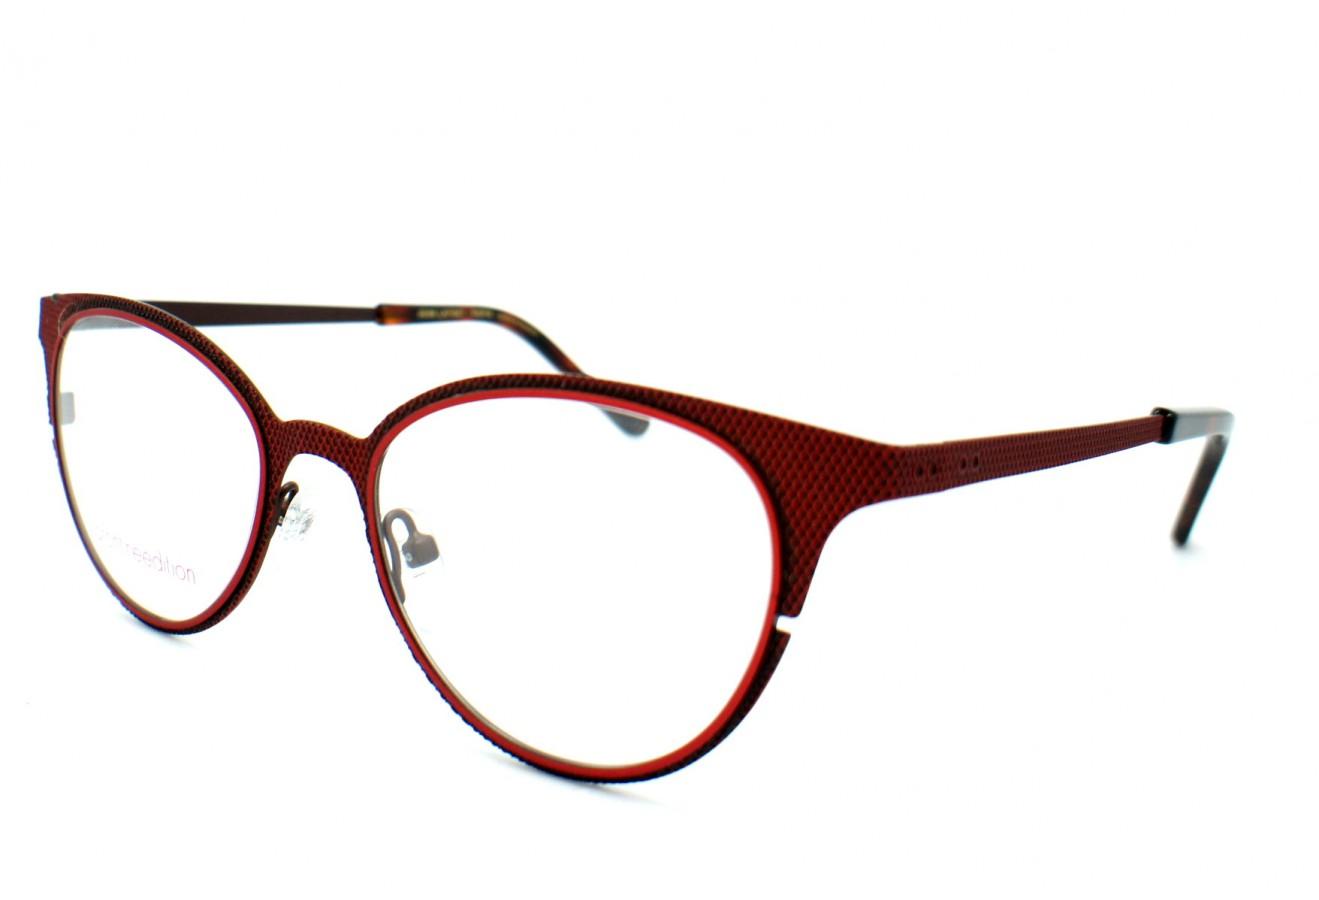 lunettes de vue lafont new york 598 49 18. Black Bedroom Furniture Sets. Home Design Ideas